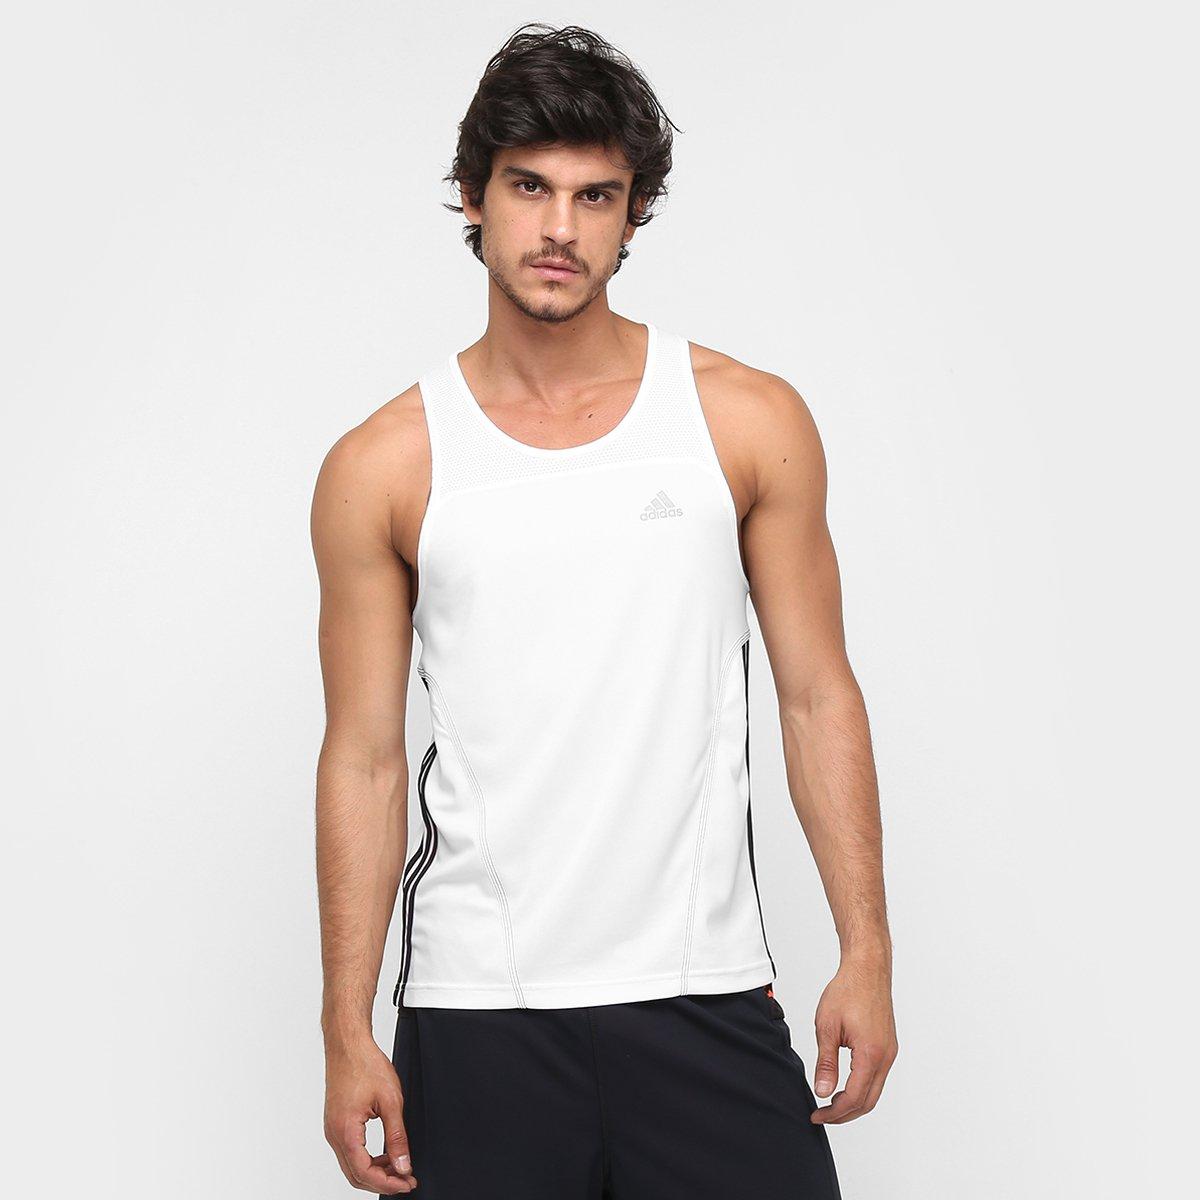 8a97827b188e2 Camiseta Regata Adidas Response - Compre Agora